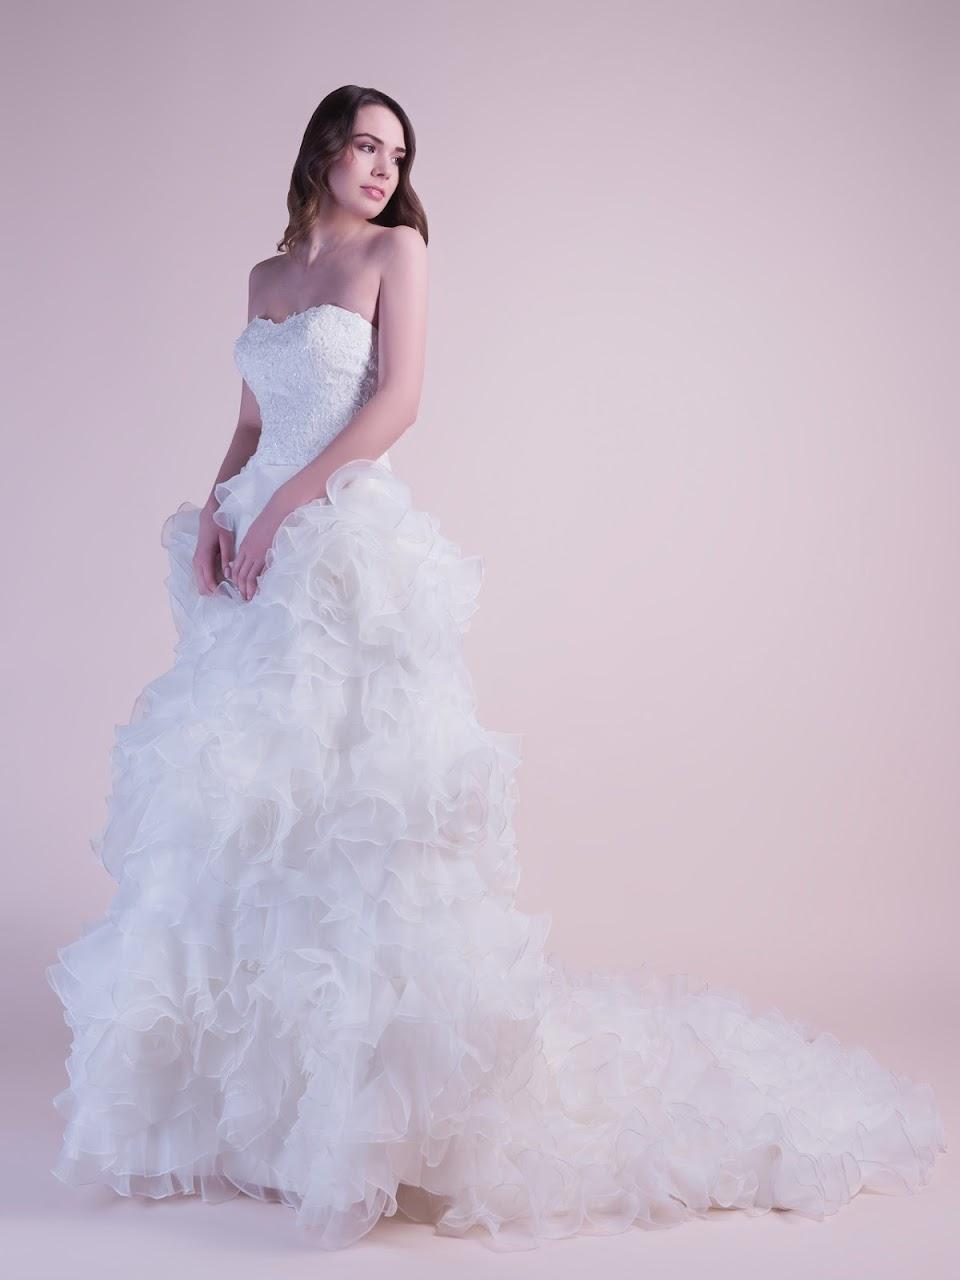 robe-de-mariee-delphine-transformable-en-robe-de-mariee-courte-en-moins-de-cinq-secondes